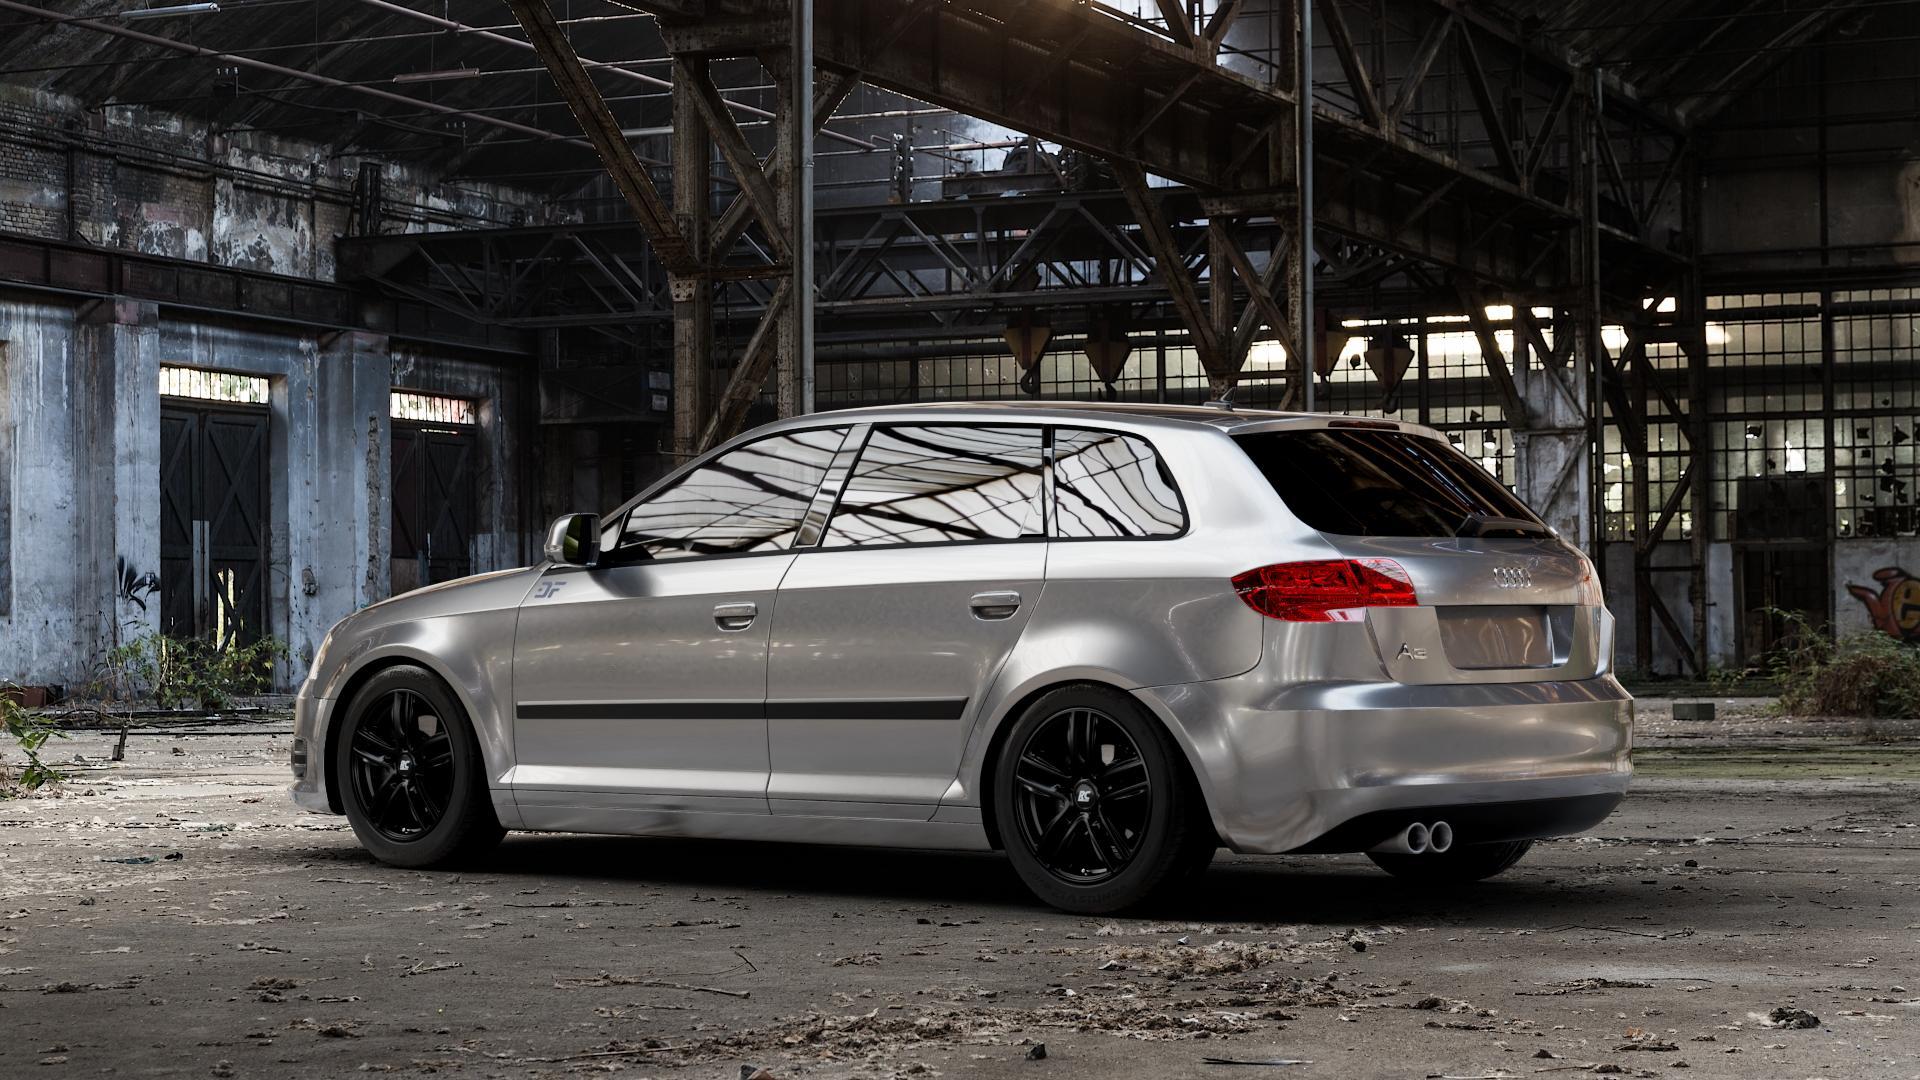 RC Design RC27 schwarz-matt lackiert Felge mit Reifen in 16Zoll Winterfelge Alufelge auf silbernem Audi A3 Typ 8P (Sportback) 1,6l 75kW (102 PS) 2,0l FSI 110kW (150 1,9l TDI 77kW (105 103kW (140 TFSI 147kW (200 85kW (116 100kW (136 1,8l 118kW (160 125kW (170 1,4l 92kW (125 120kW (163 quattro 3,2l V6 184kW (250 S3 195kW (265 1,2l 66kW (90